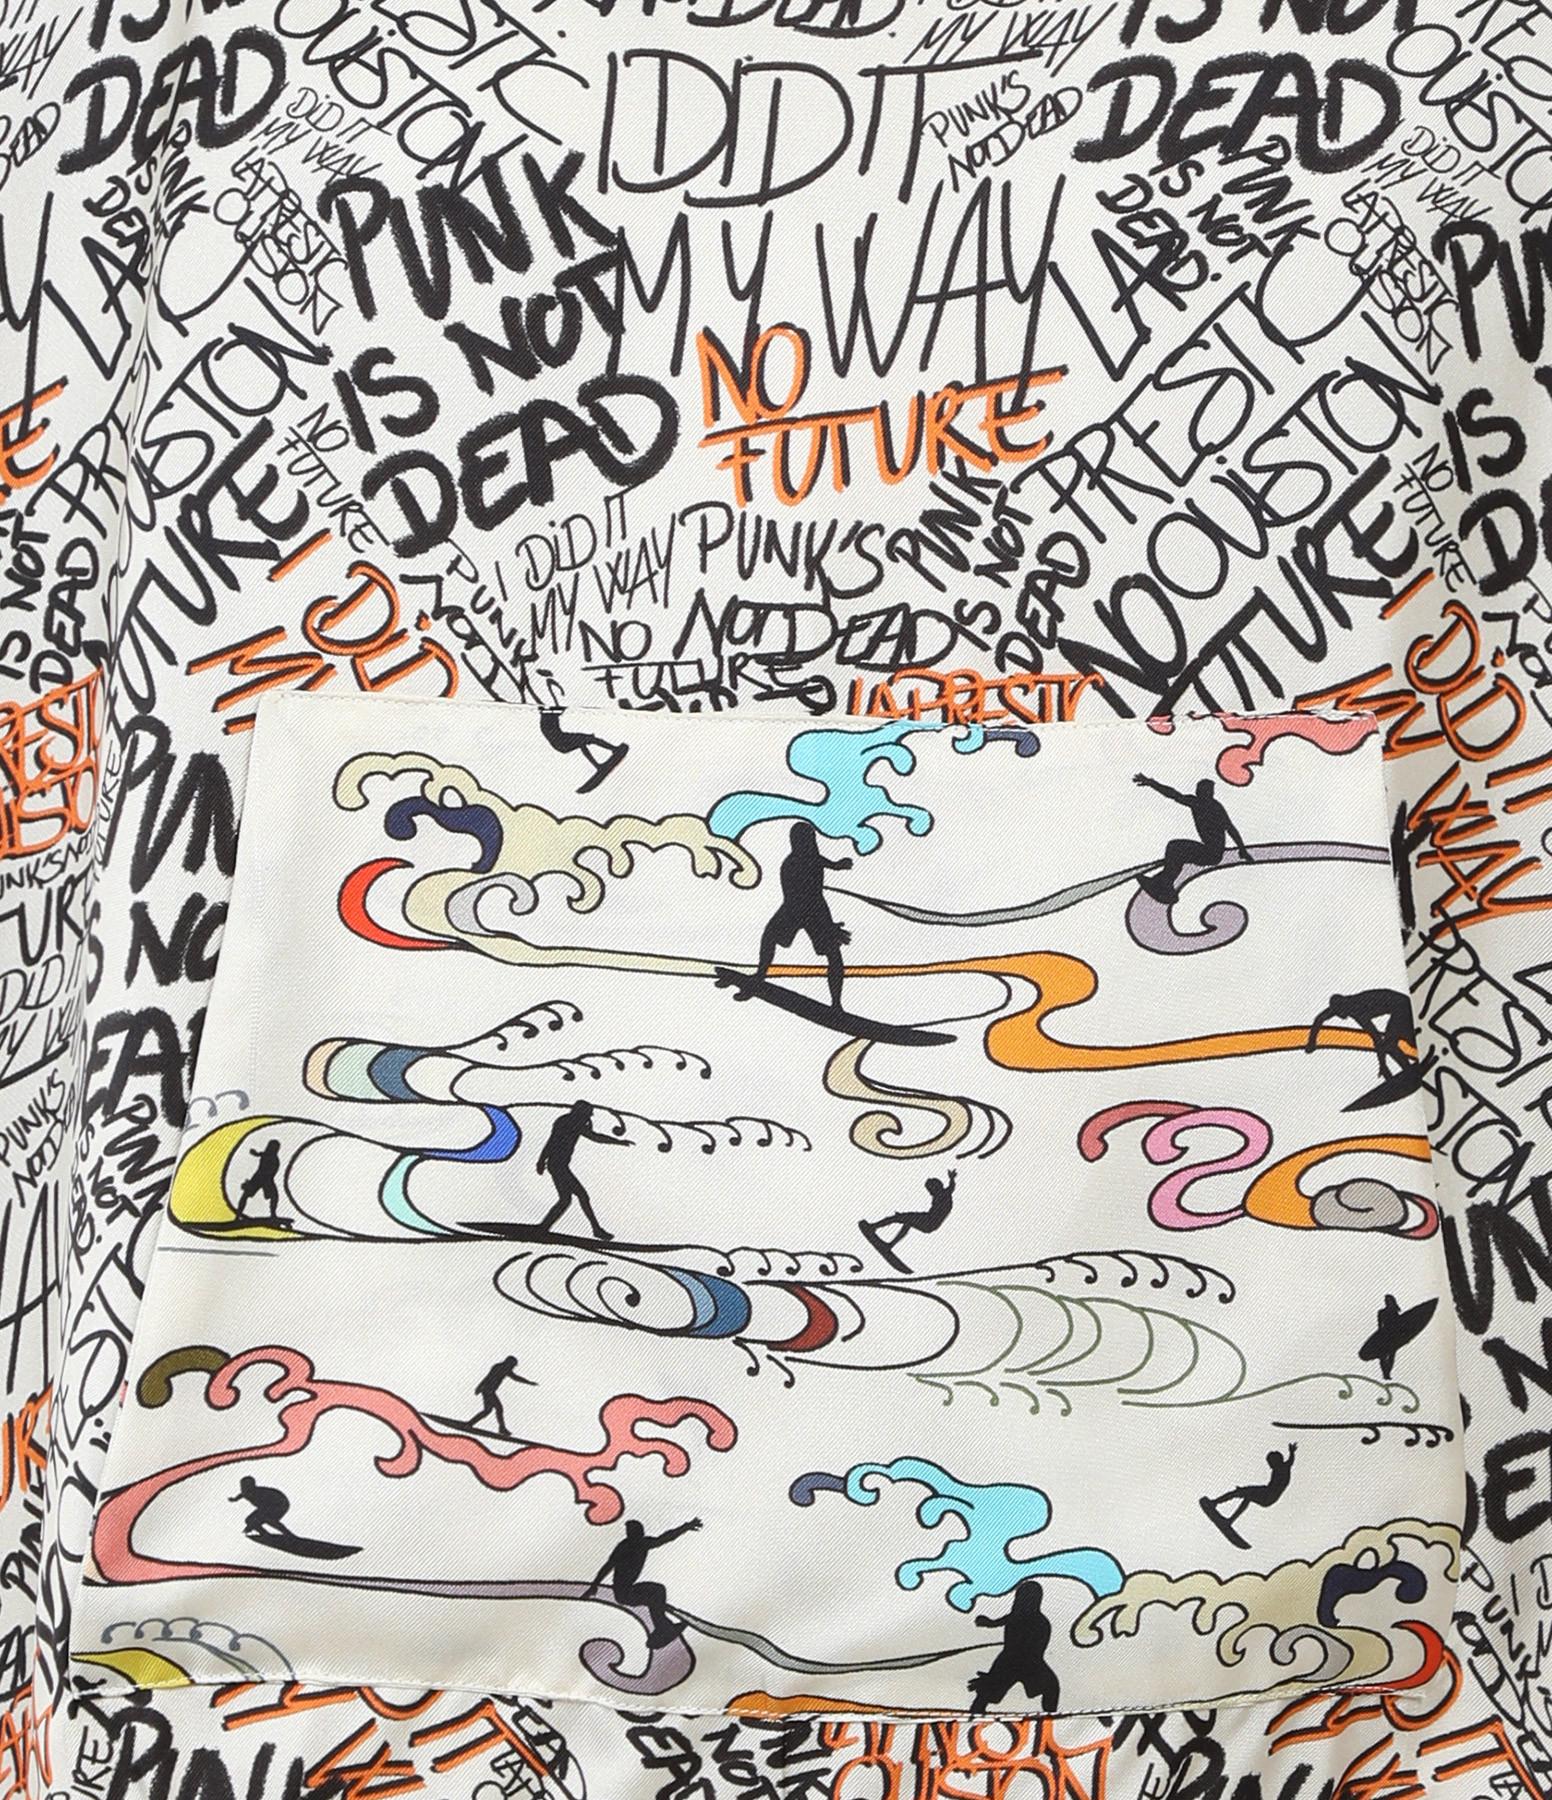 LA PRESTIC OUISTON - Sweatshirt Hoodie Soie Graffiti